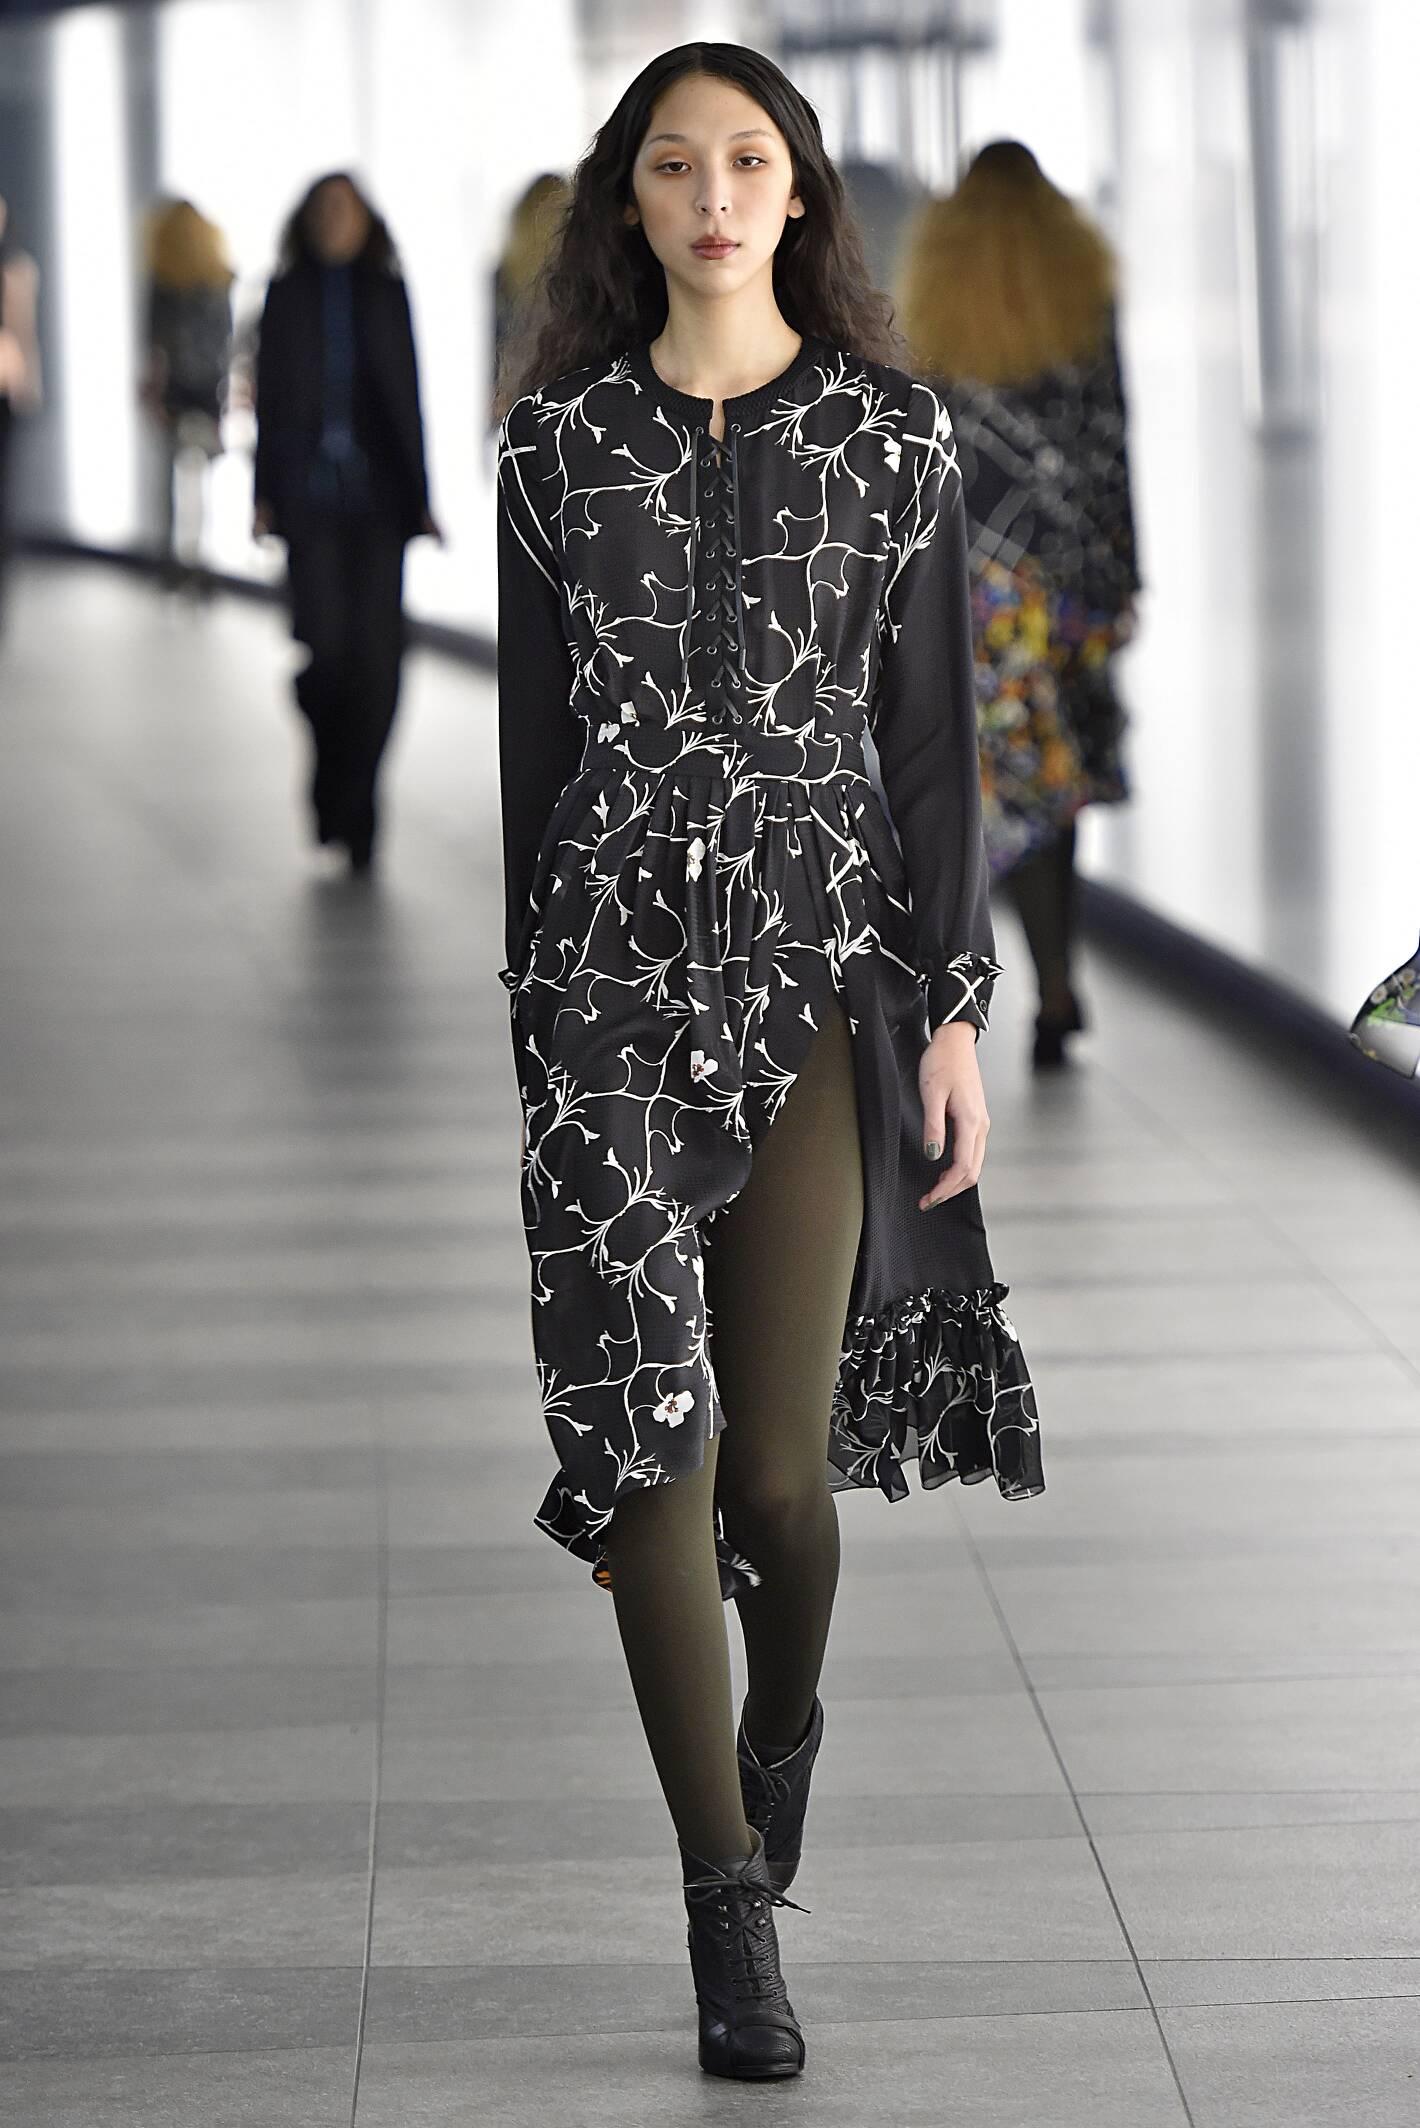 Catwalk Preen by Thornton Bregazzi Womenswear Collection Winter 2015